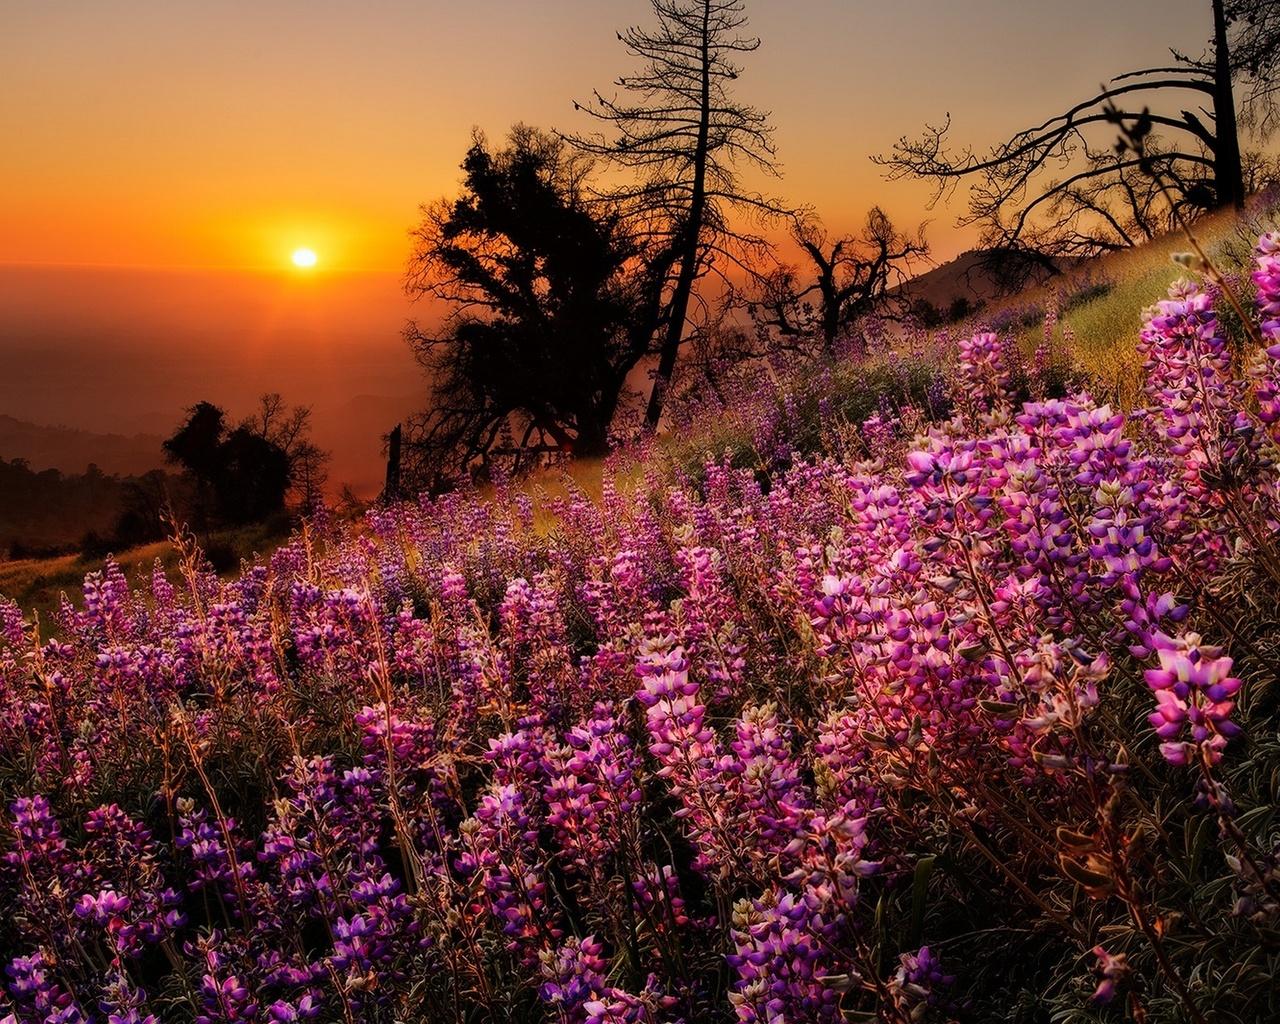 природа, пейзаж, лето, закат, солнце, склон, цветы, травы, деревья